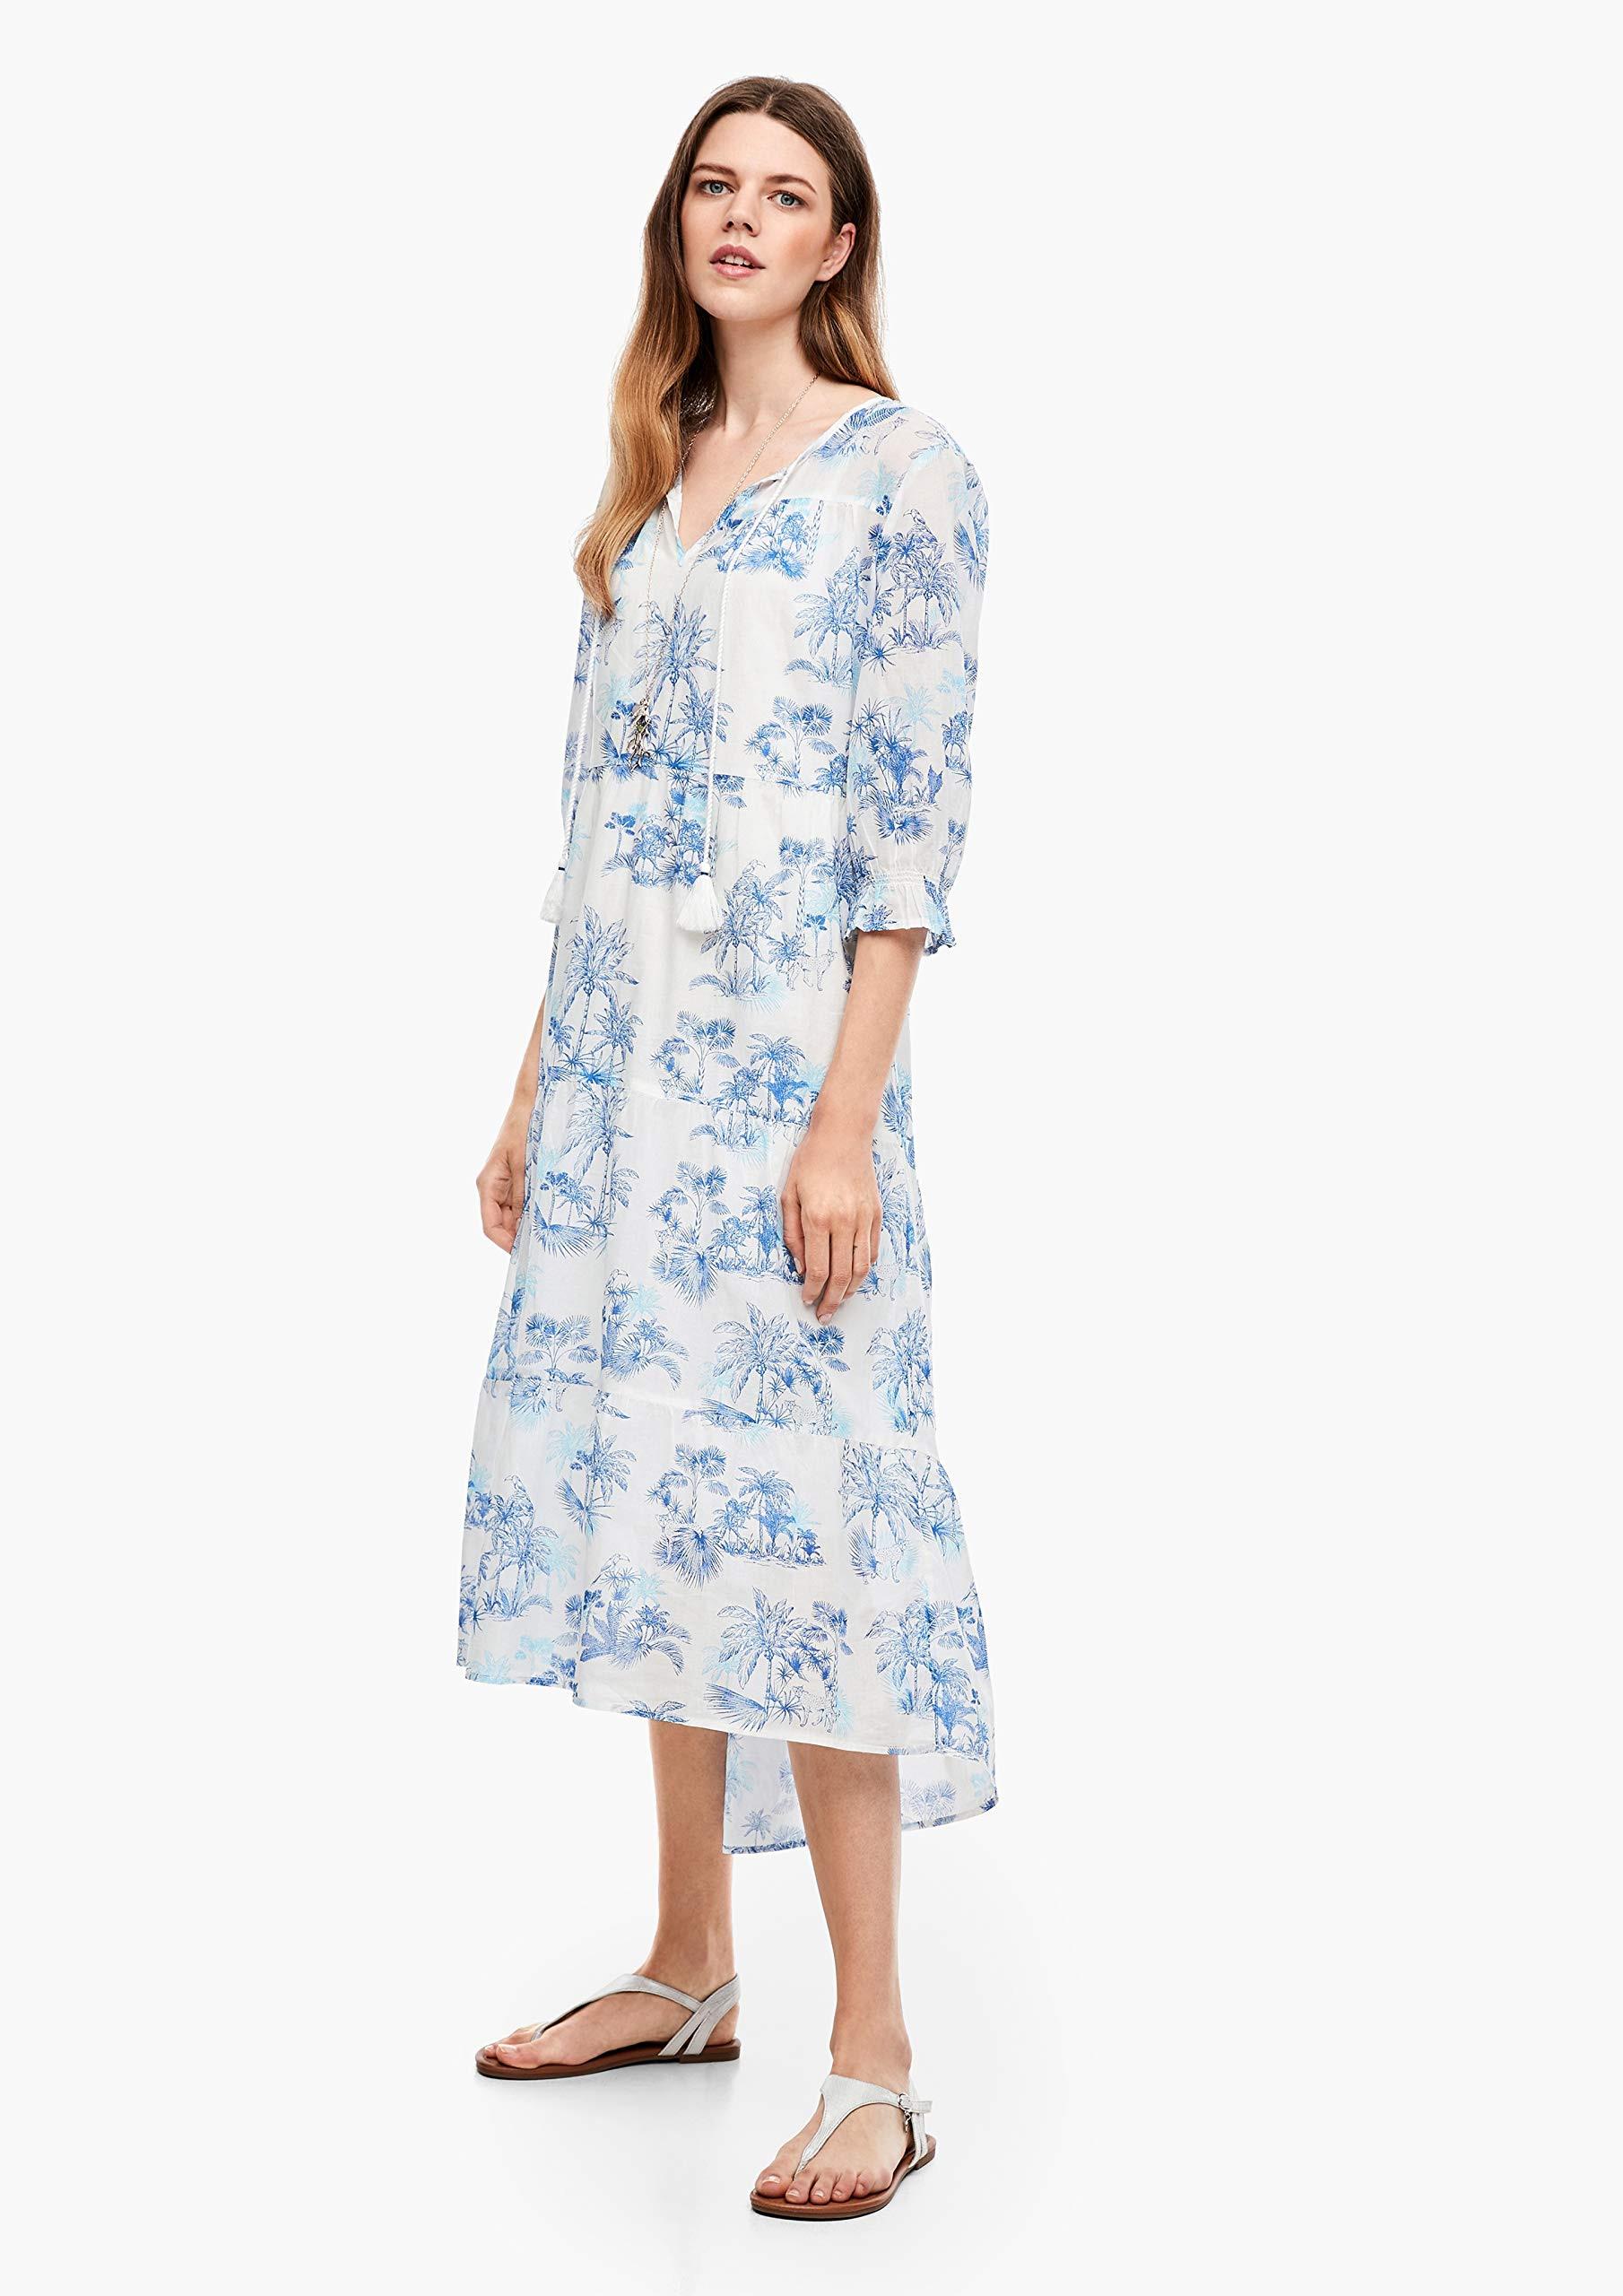 Soliver Maxikleider Frauen 2042121 Creme  Outfits24De